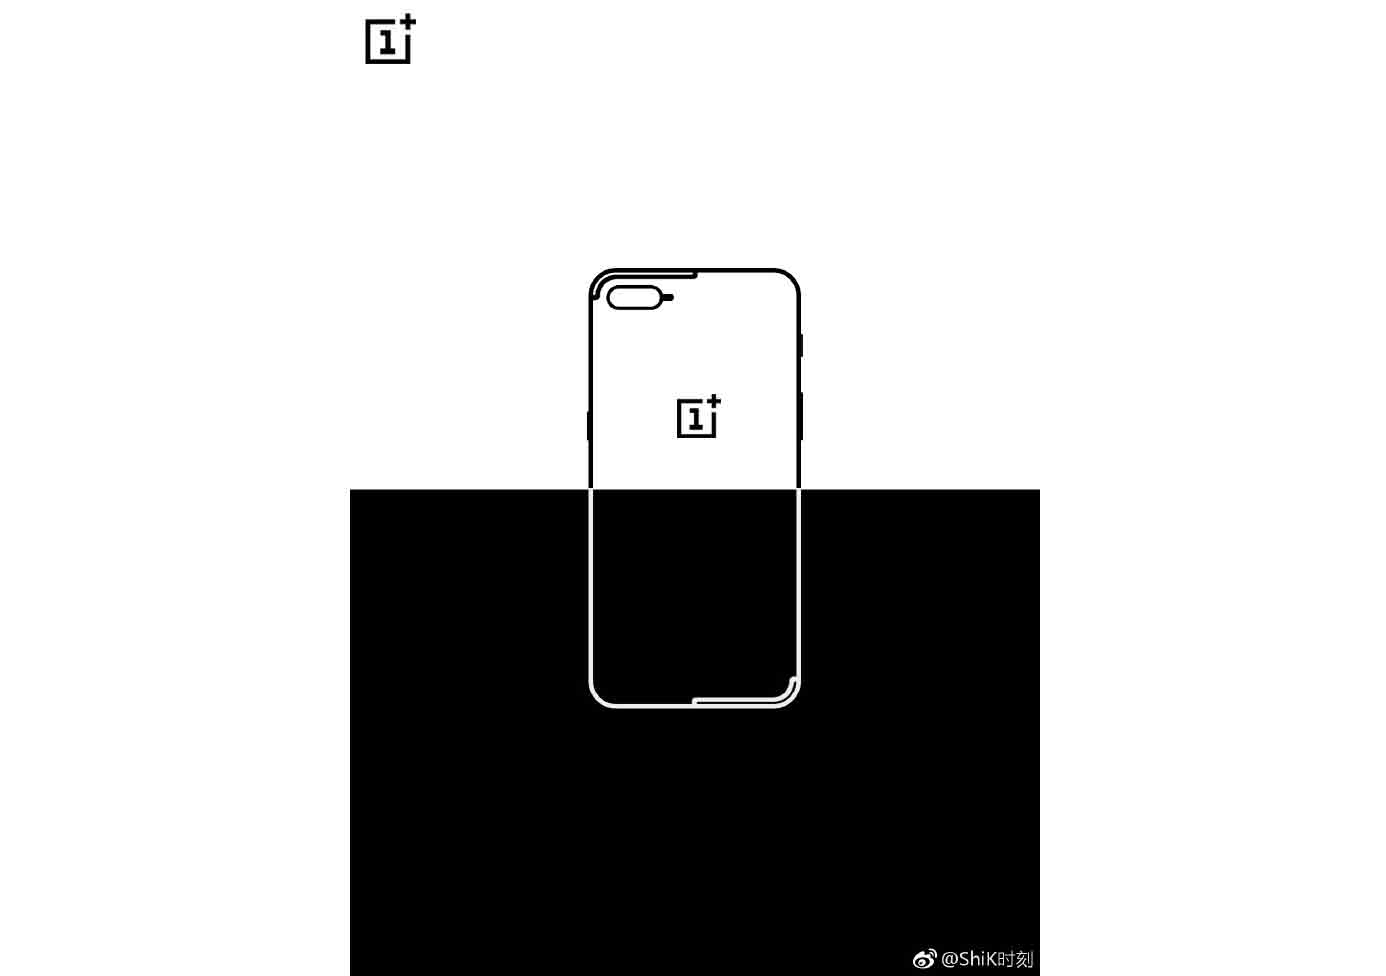 OnePlus 5 Render TechDroider